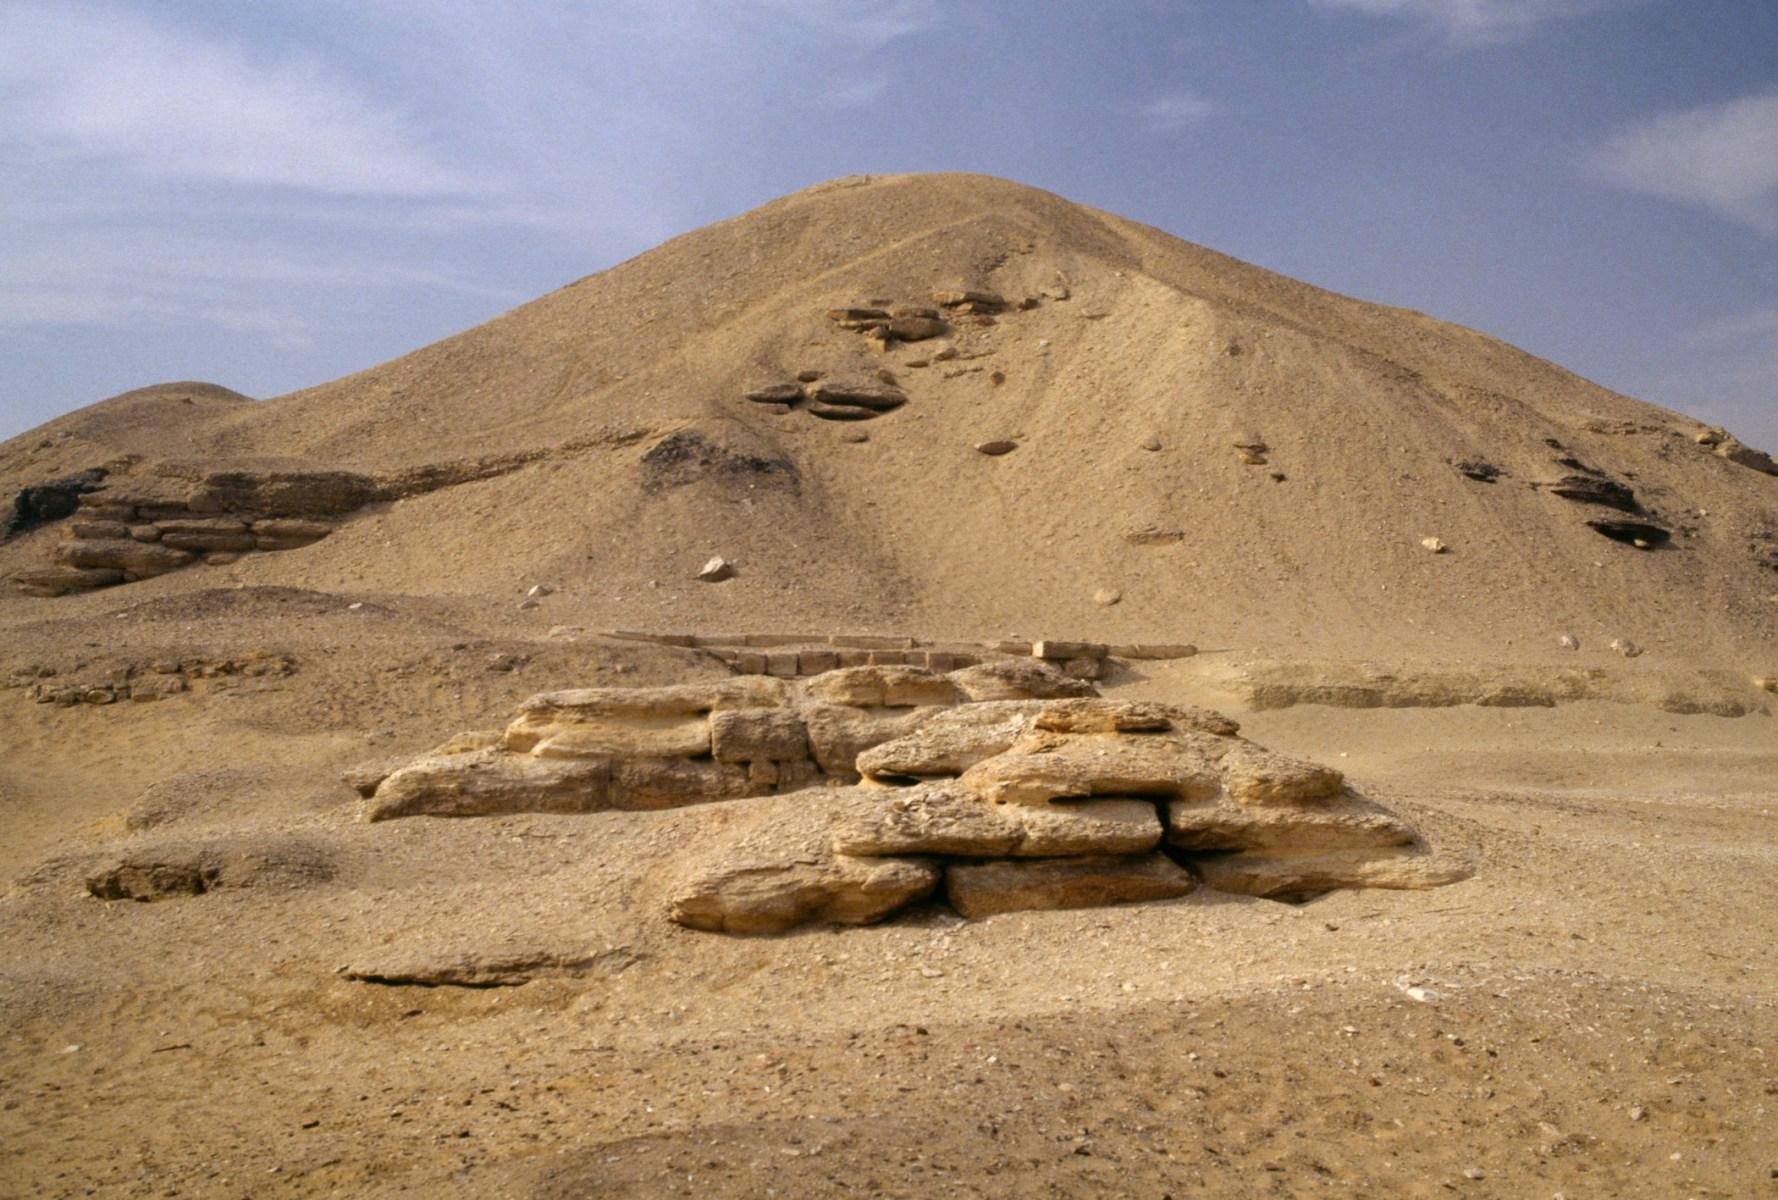 Pyramid of Amenemhet I, el-Lisht, Egypt. Egyptian civilisation, Middle Kingdom, Dynasty XII. (Photo by DeAgostini/Getty Images)